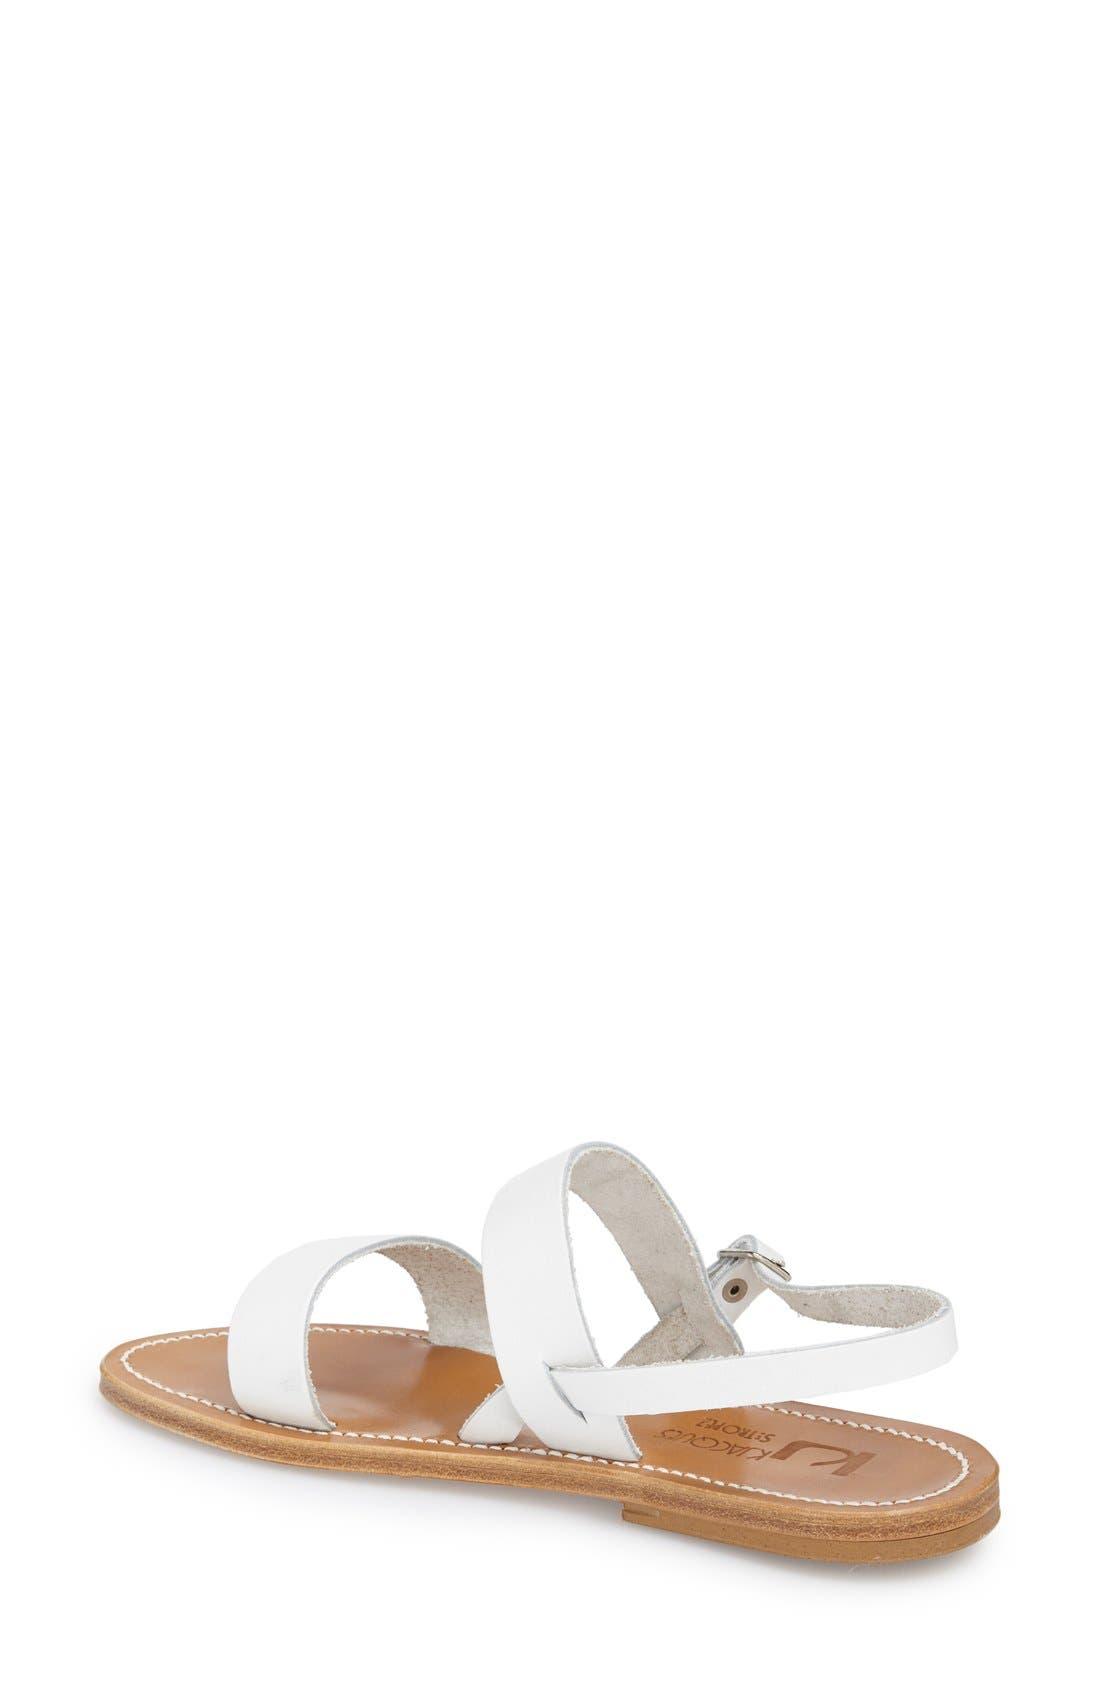 Alternate Image 2  - K Jacques St. Tropez Flat 'Barigoule' Vachetta Leather Sandal